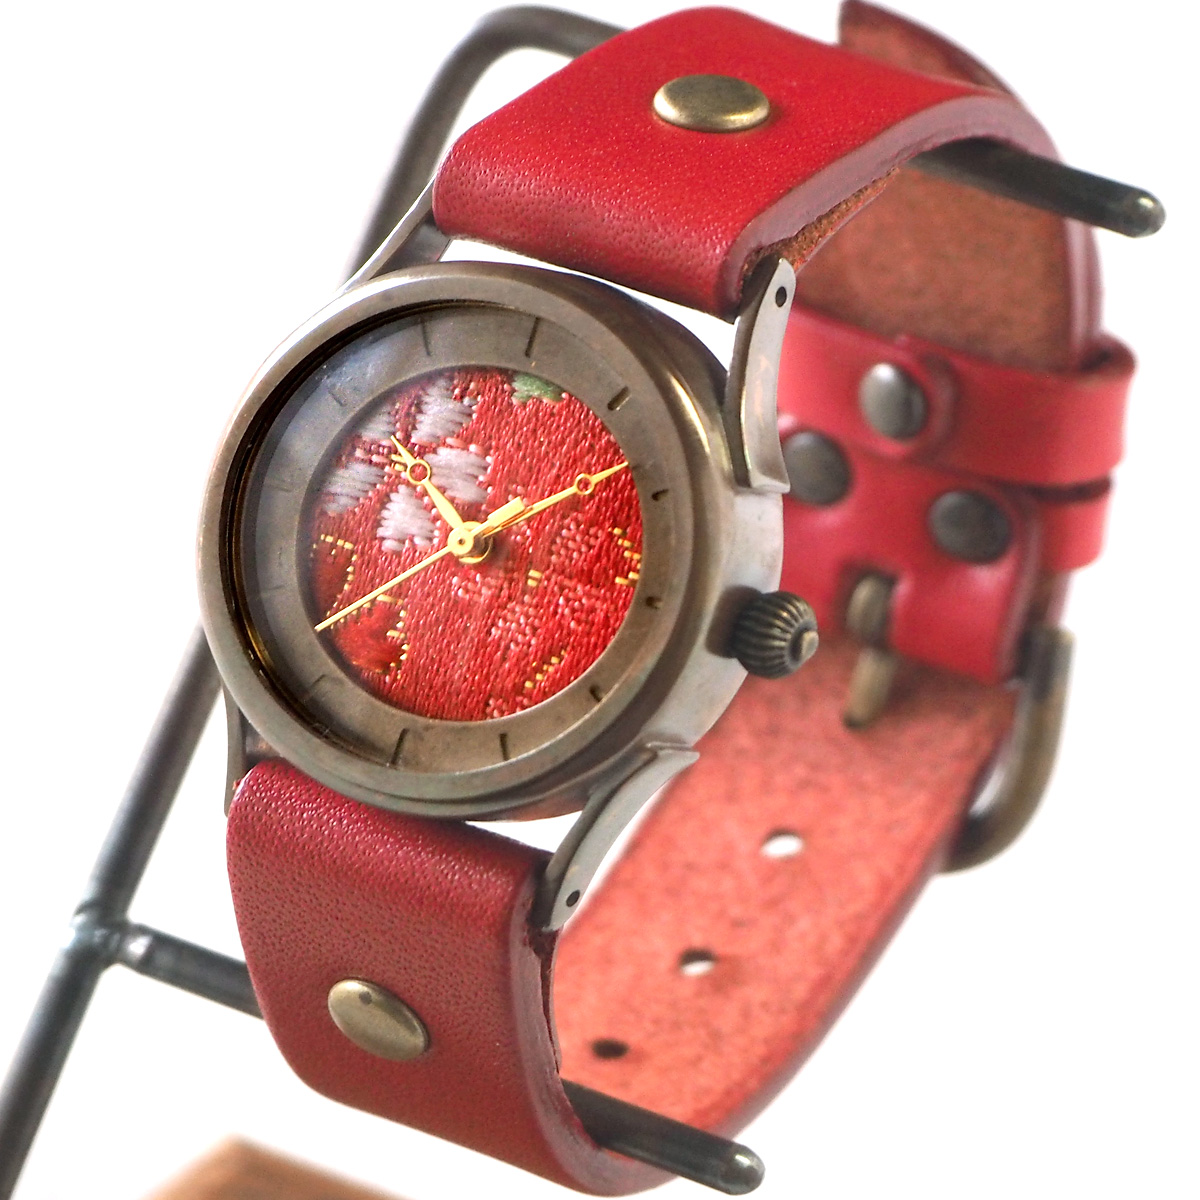 vie(ヴィー) 手作り腕時計 メイドインジャパン シリーズ 西陣織文字盤 Mサイズ [WJ-002M]